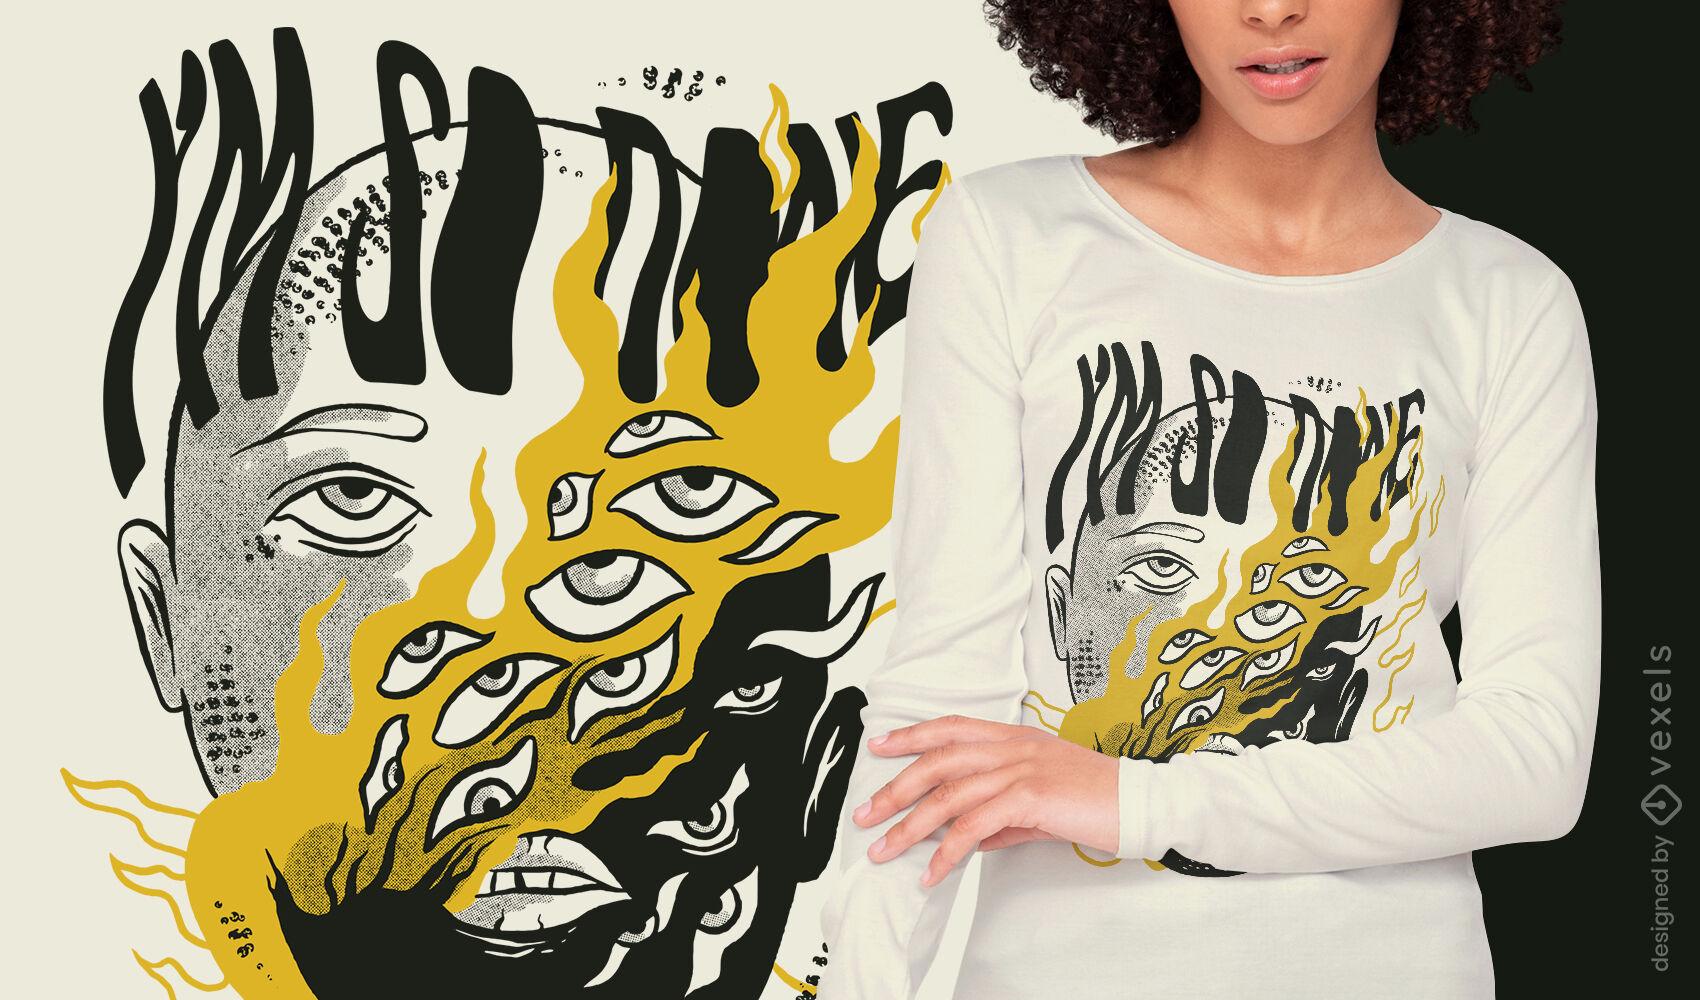 Bizarre body eyes on fire t-shirt design